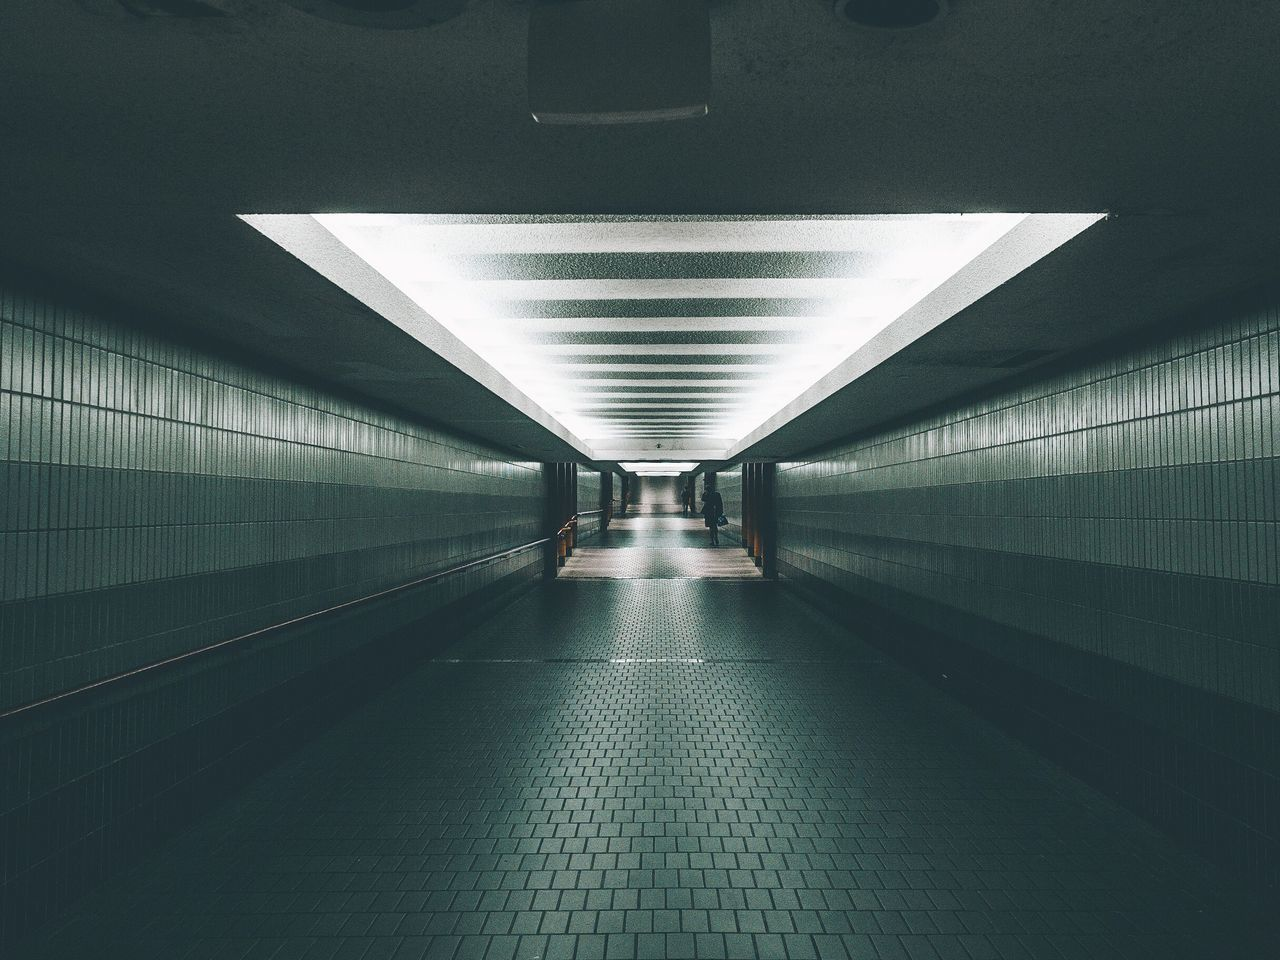 Empty subway along tiled wall